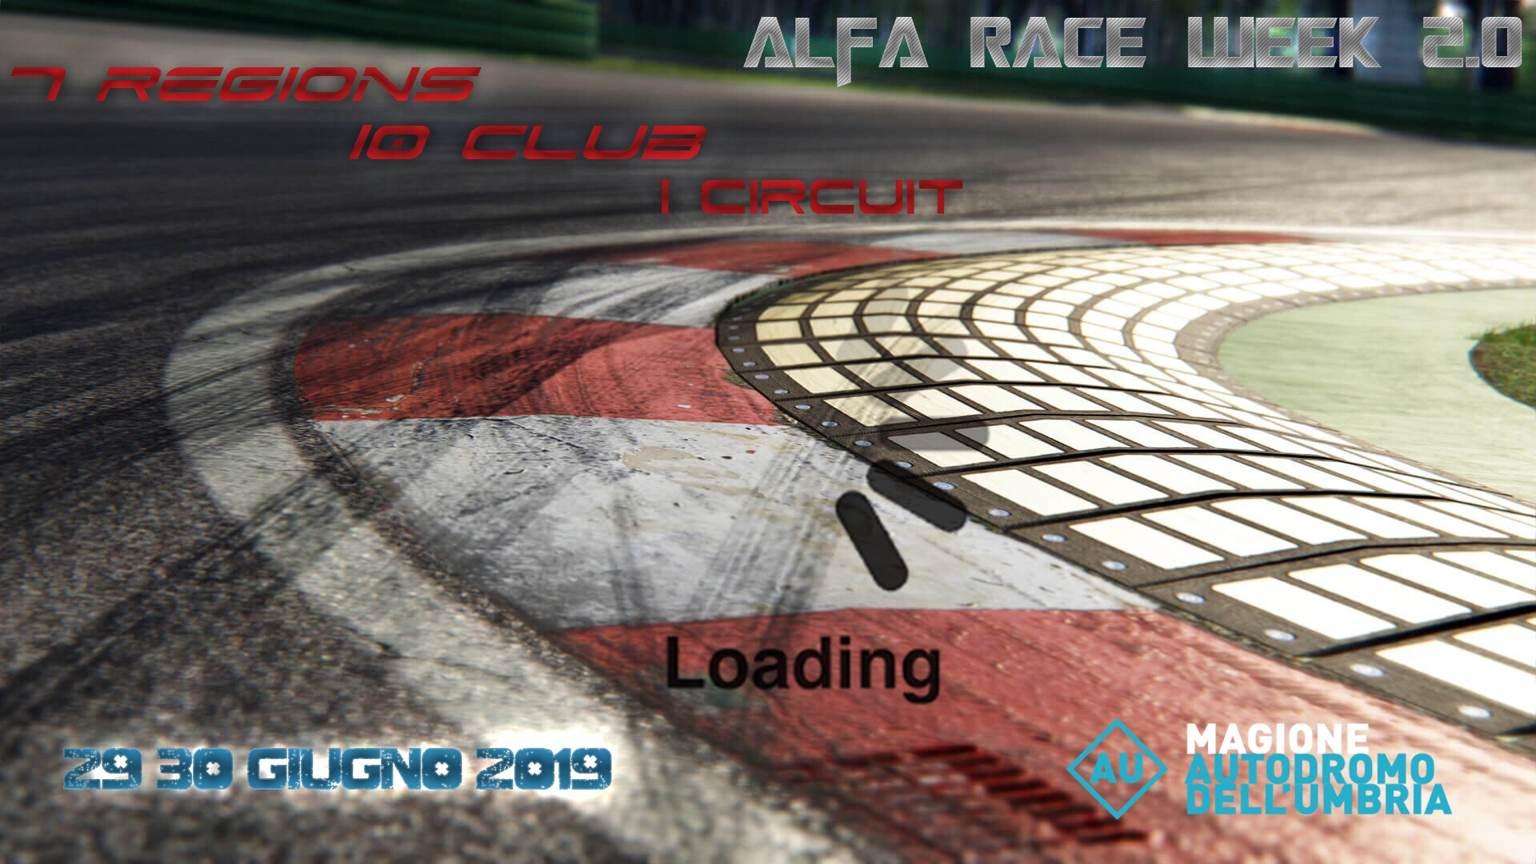 foto ALFA RACE WEEK 2.0 - 1